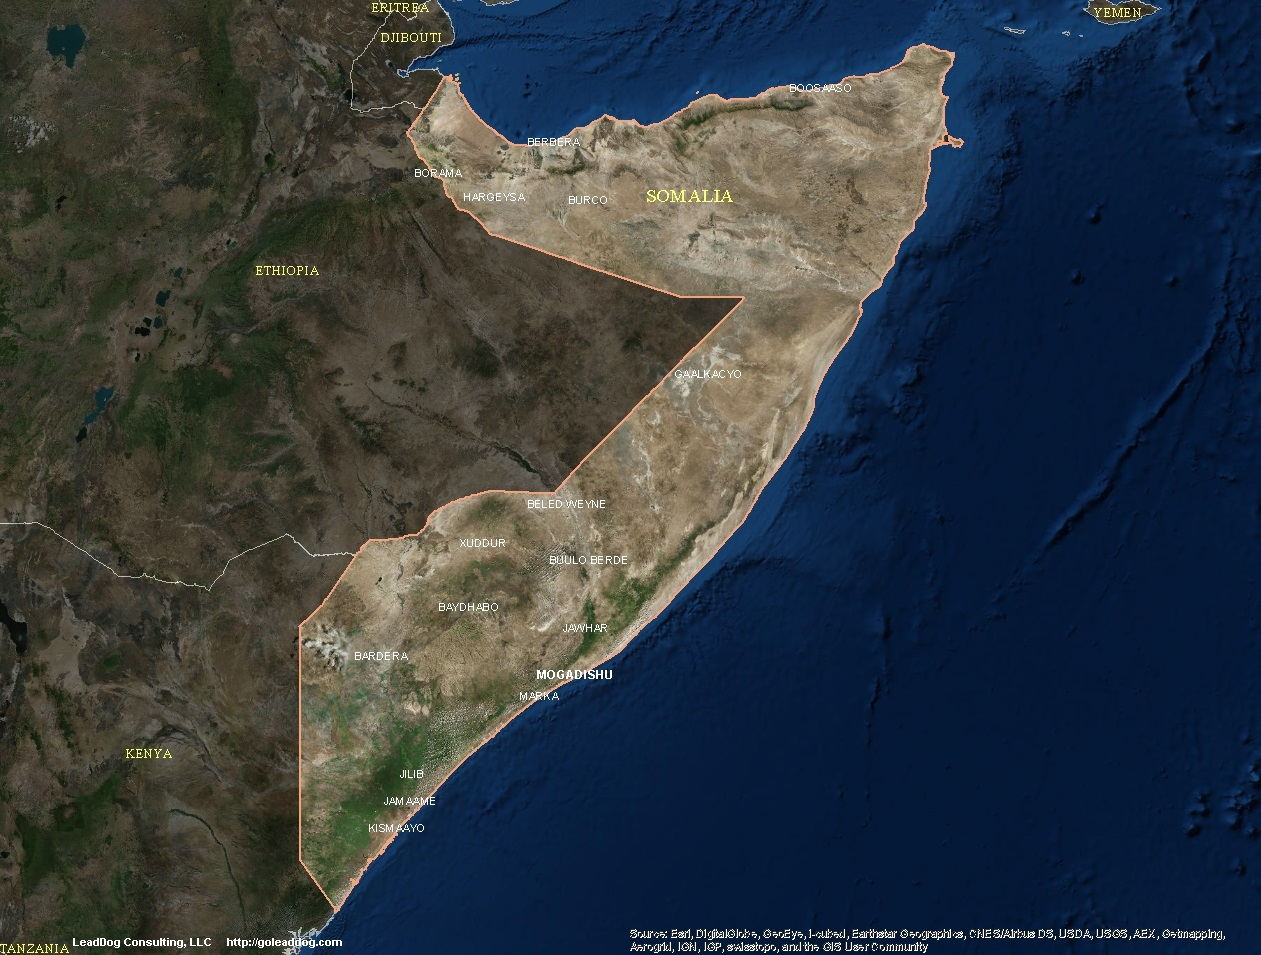 Somalia Satellite Maps | LeadDog Consulting on topo map of djibouti, political map of djibouti, sports of djibouti, detailed map of djibouti, terrain map of djibouti, outline map of djibouti, blank map of djibouti, world map of djibouti, street map of djibouti, physical map of djibouti, topographical map of djibouti,